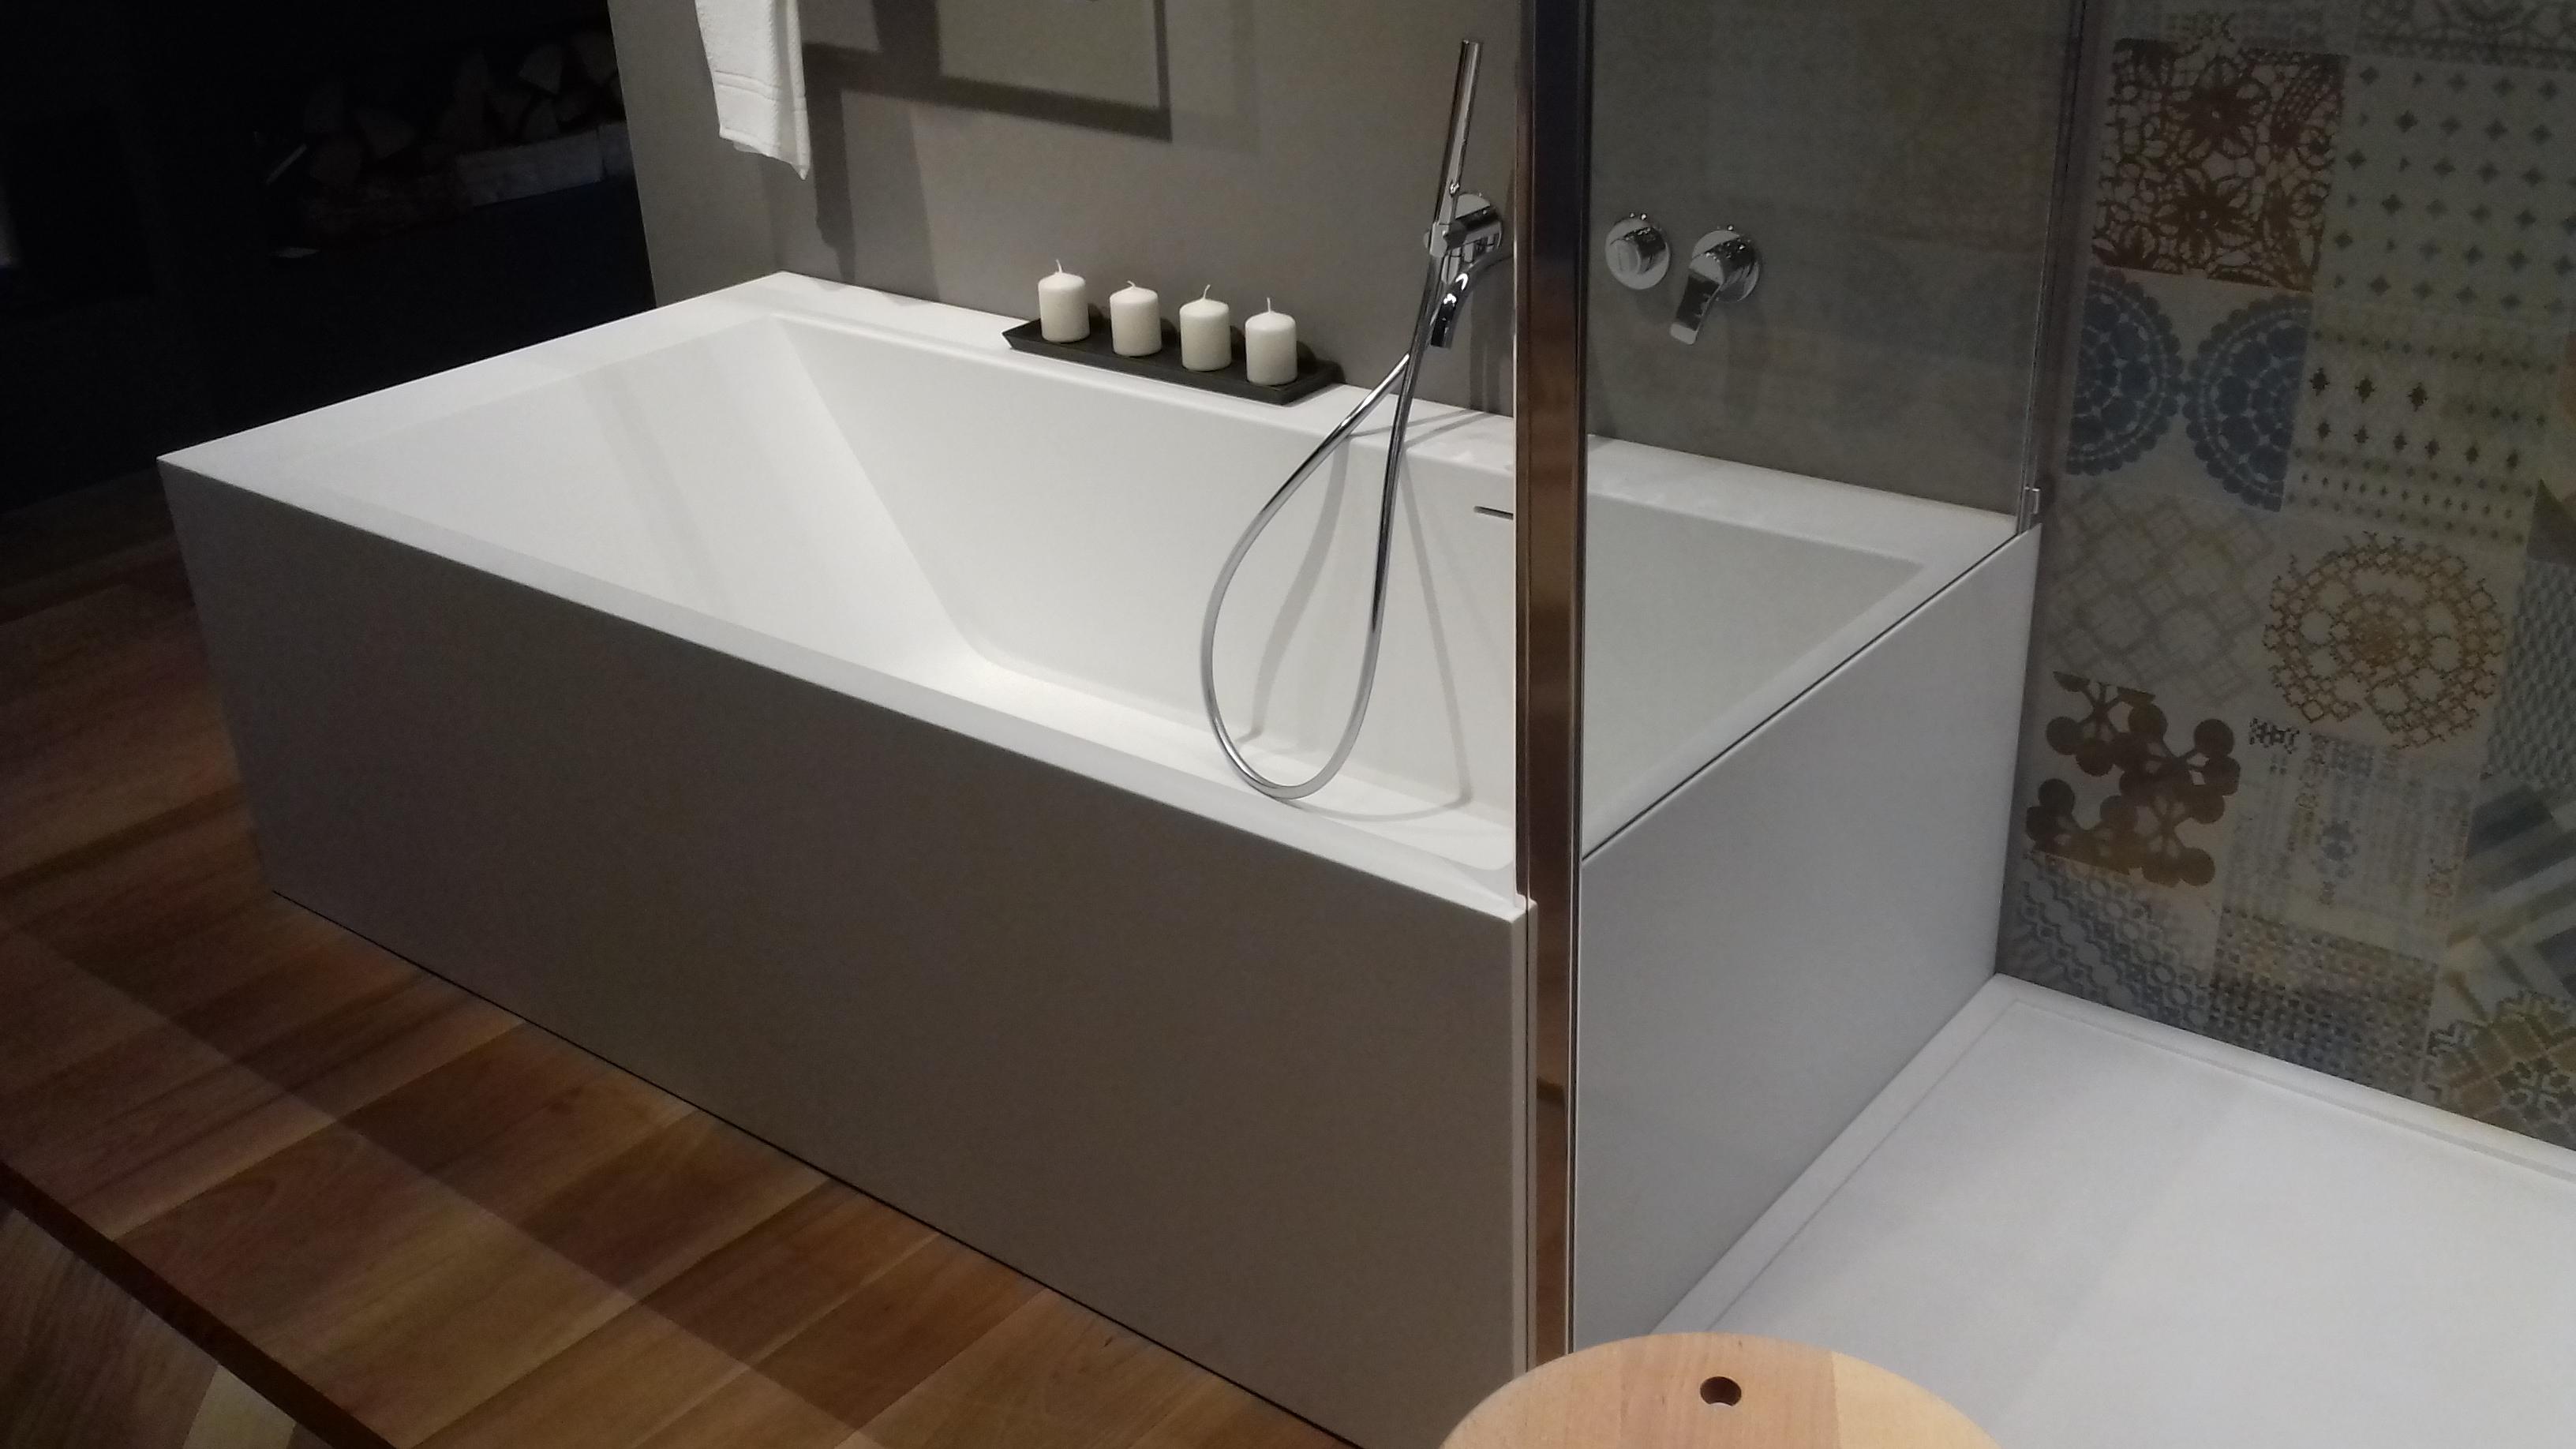 Vasche da bagno outlet roma outlet mondo convenienza roma lissone